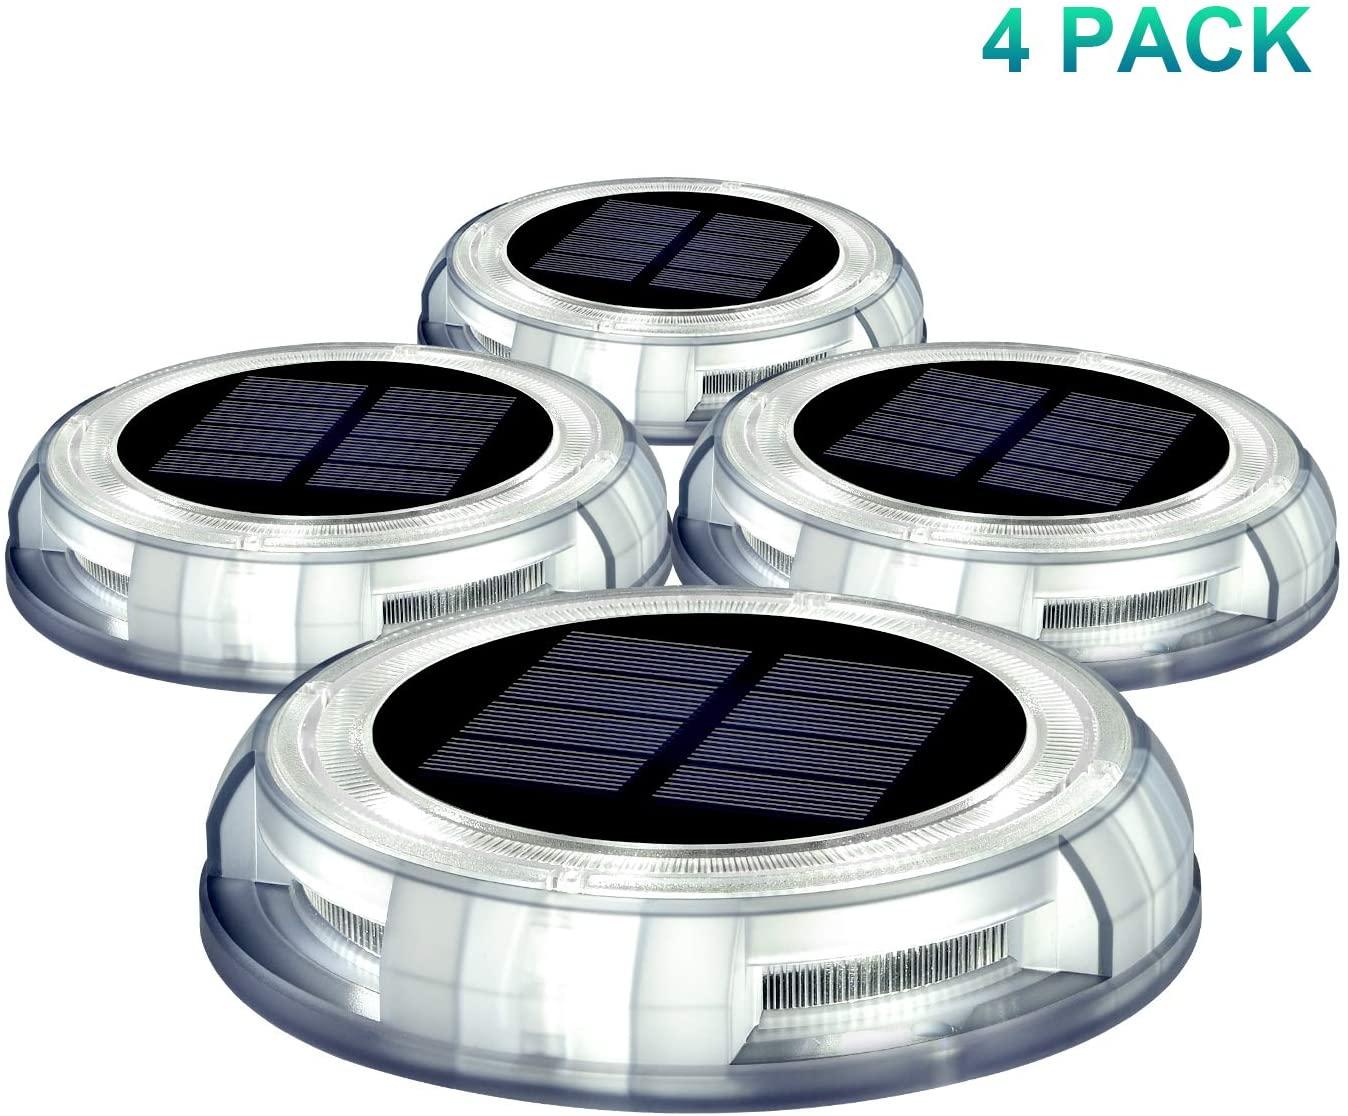 Solar Landscape Light, 4 Pack Solar Powered Deck Light Ground Lights for Stair Garden Yard, Outdoor Waterproof Holiday LED Dock Lights Step Lights (White)